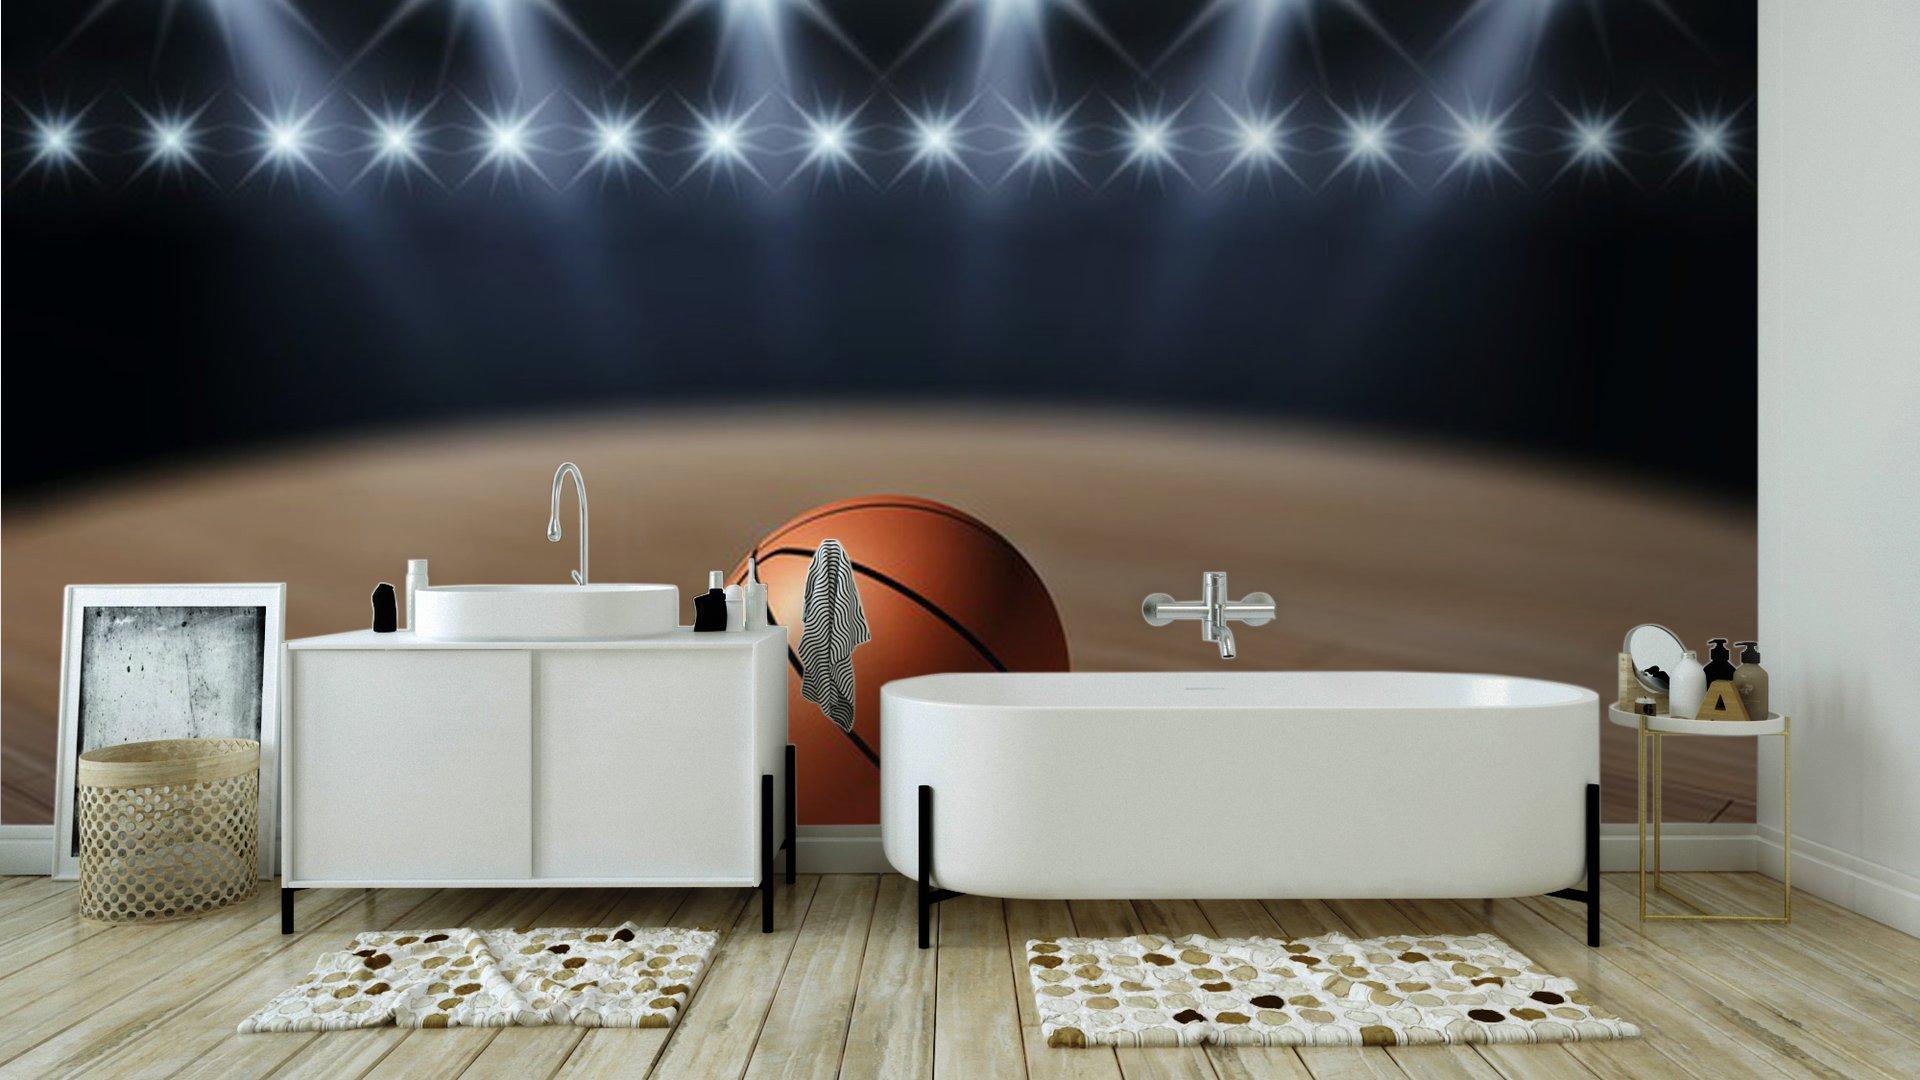 Vinyl wall mural ball on basketball court basketball for Basketball court wall mural